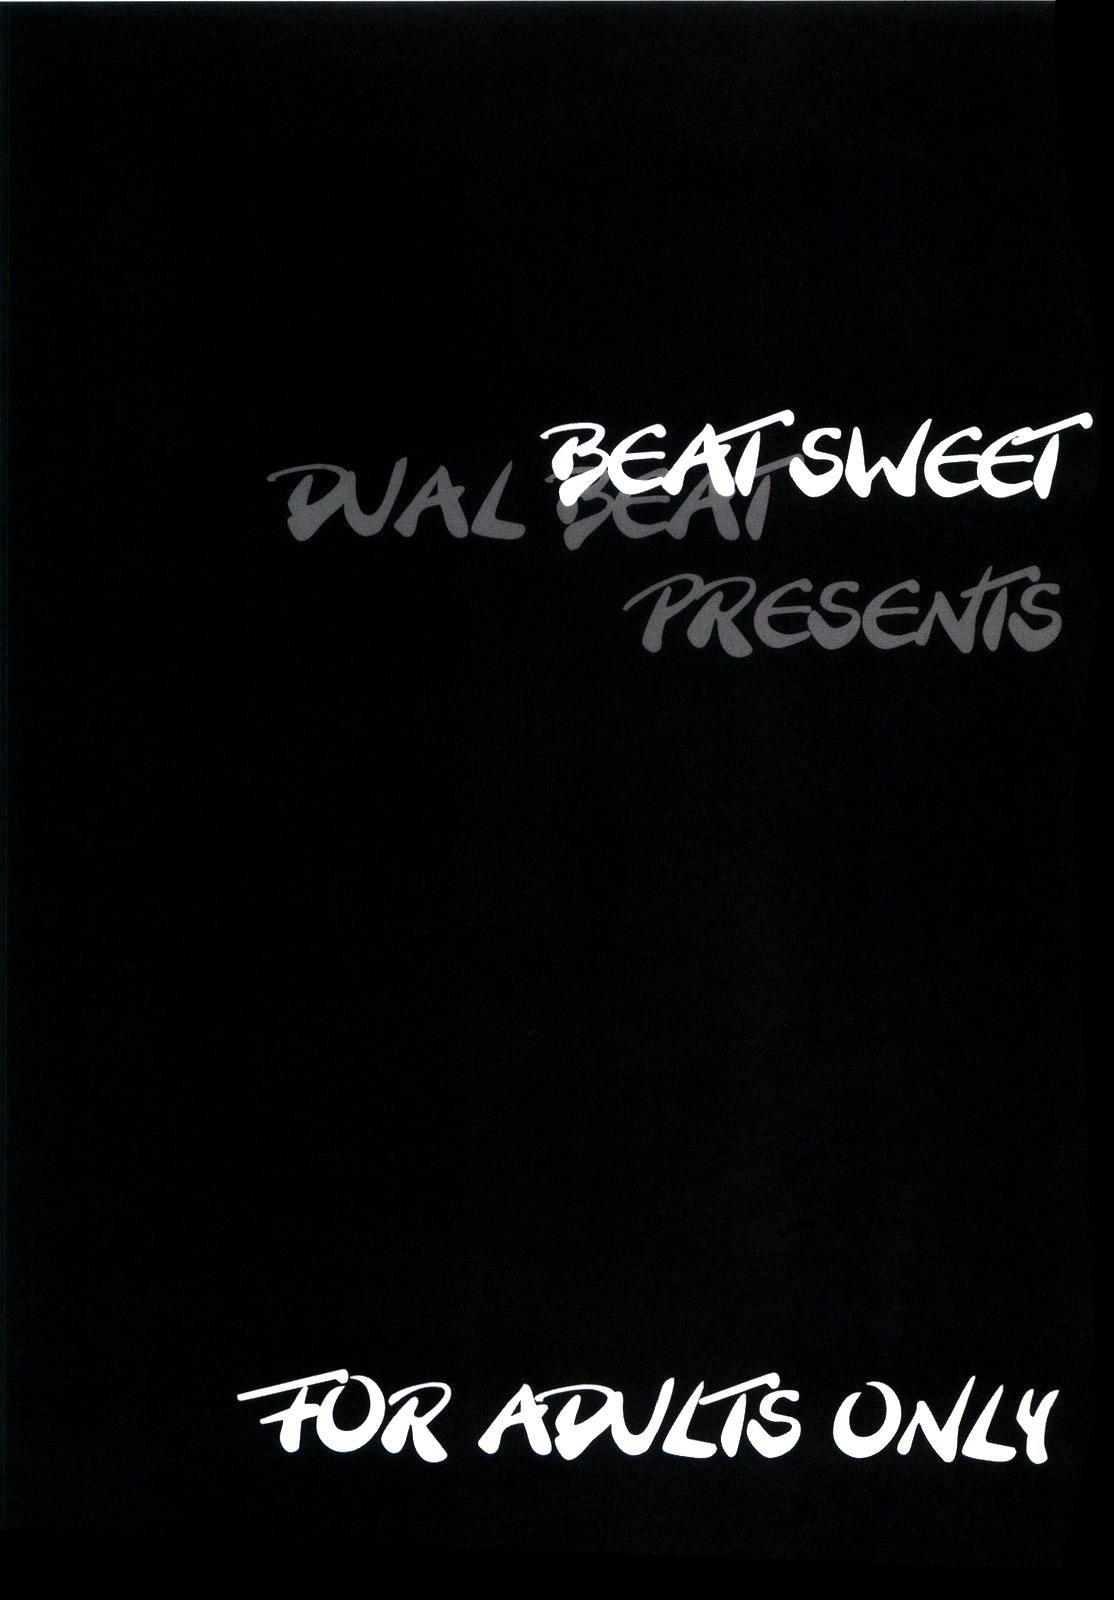 BEAT SWEET 2